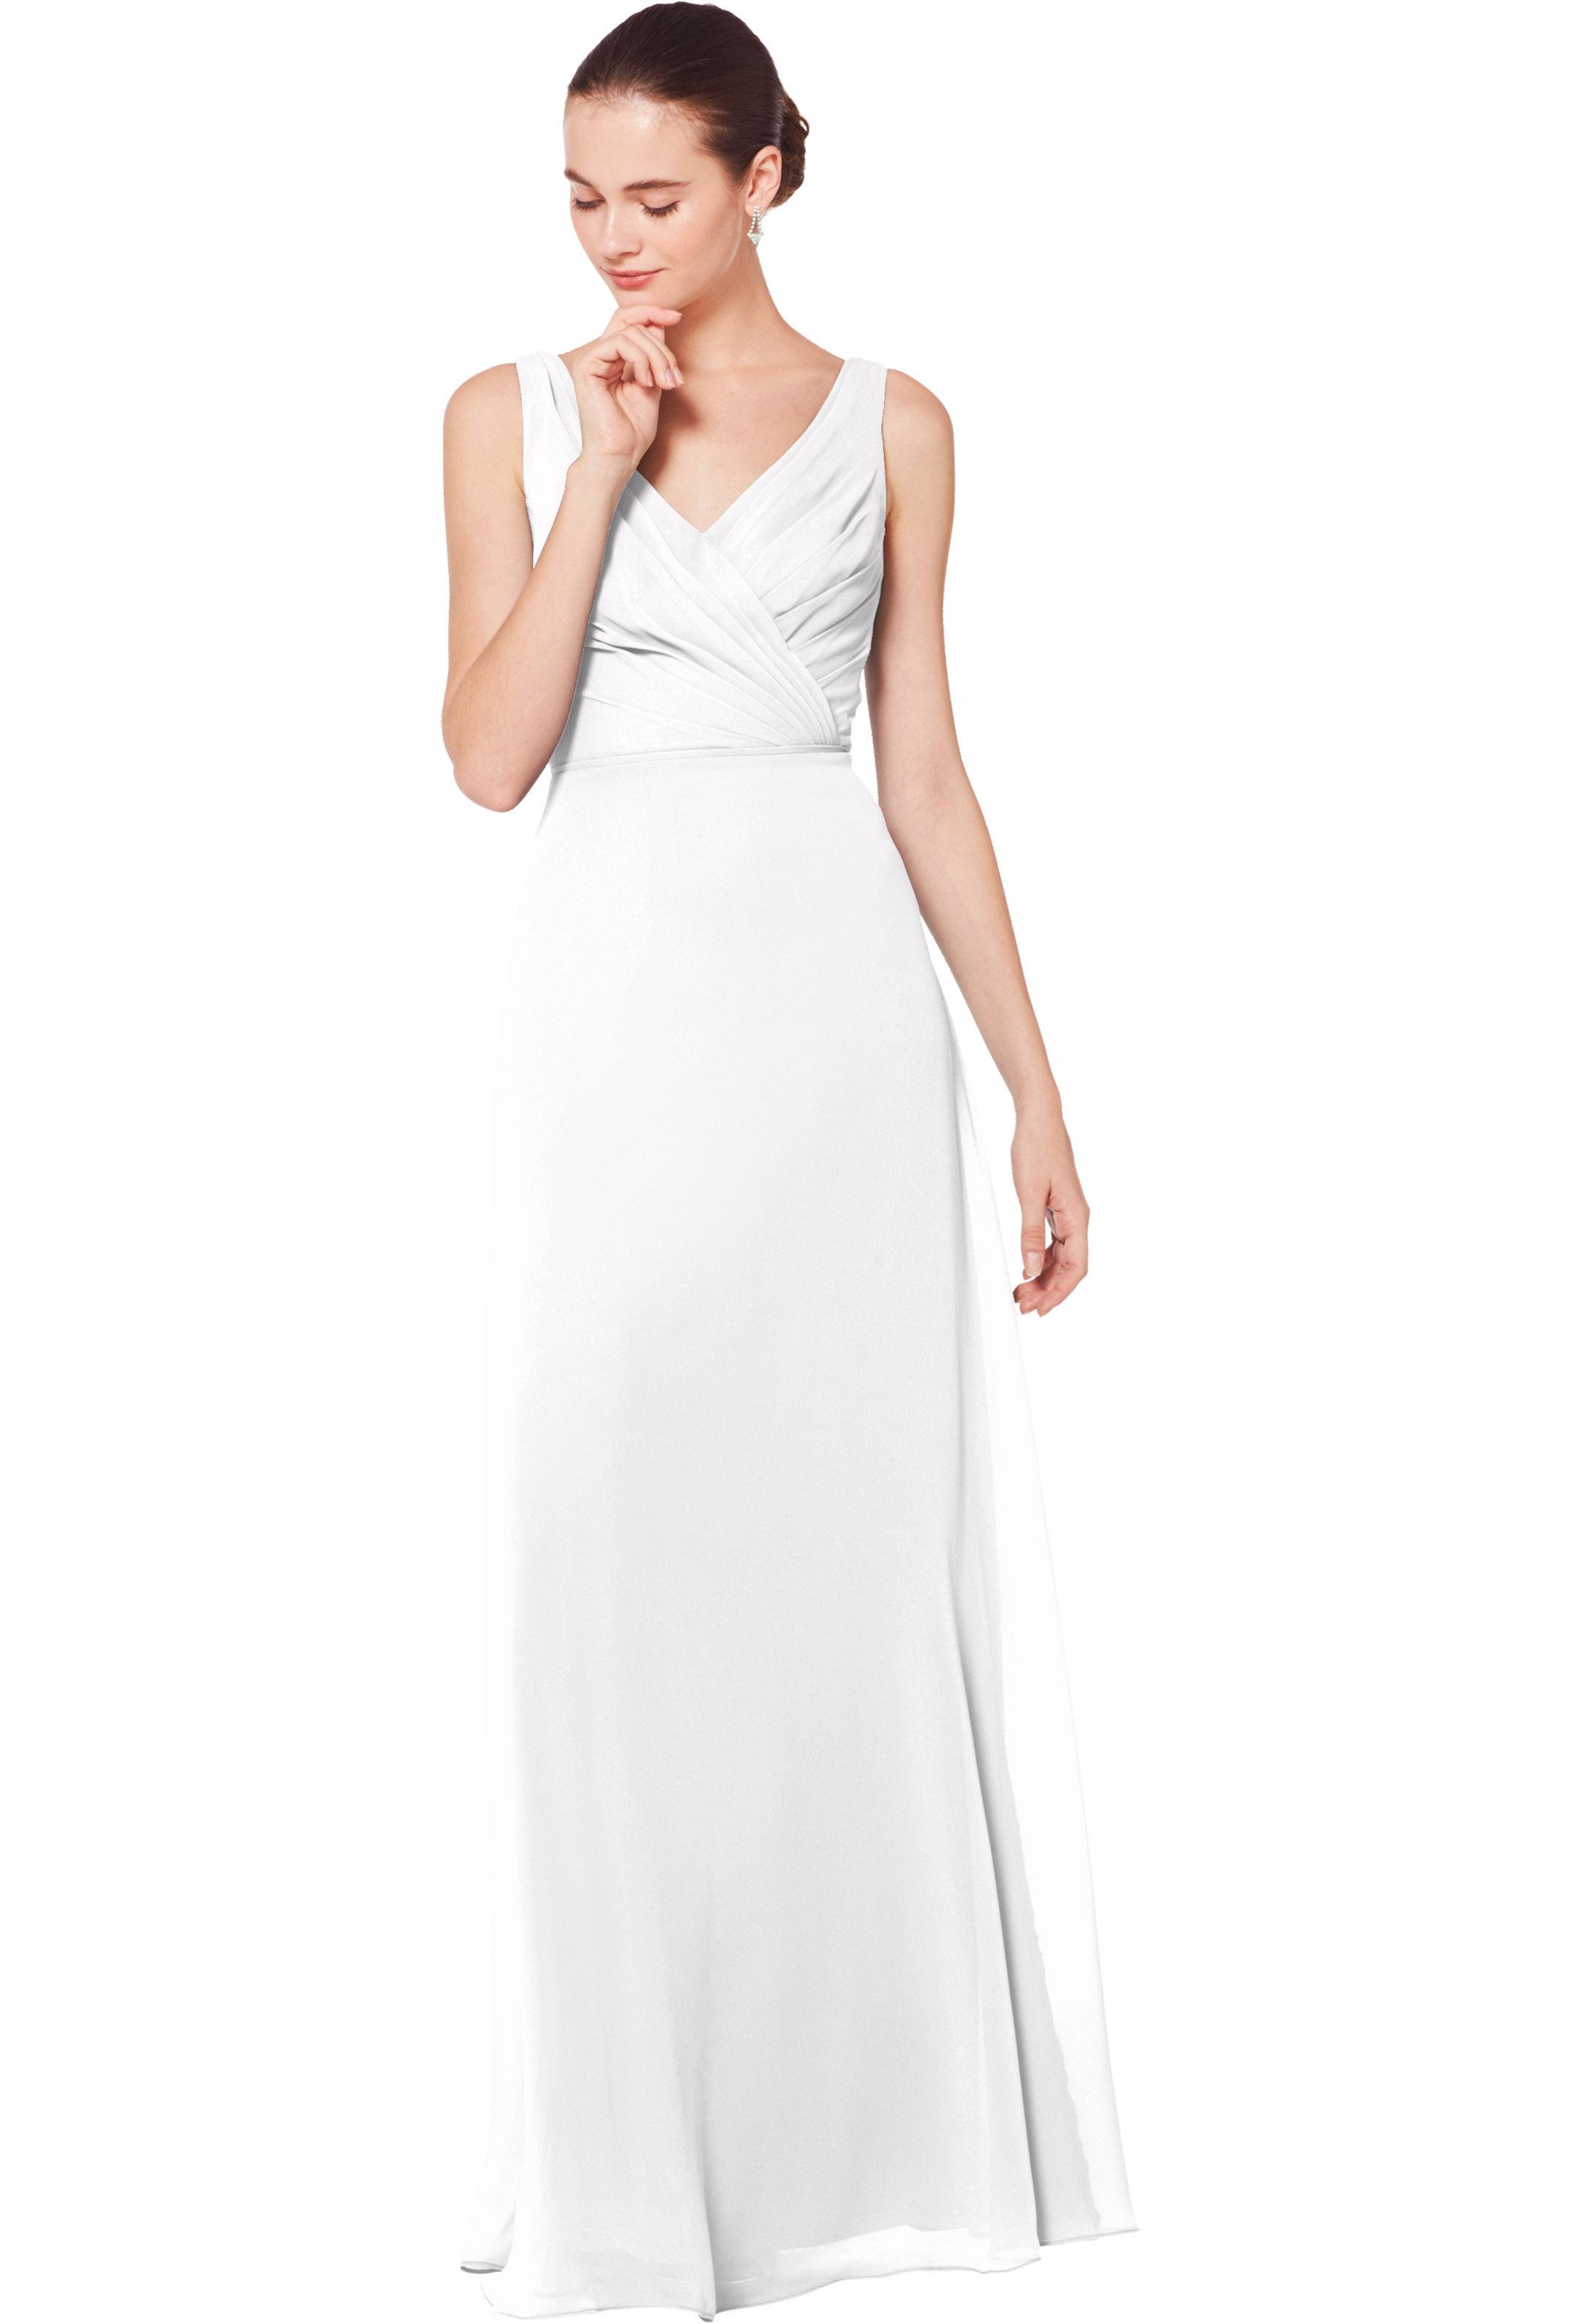 Bill Levkoff WHITE Chiffon Sleeveless Natural Waist gown, $178.00 Front